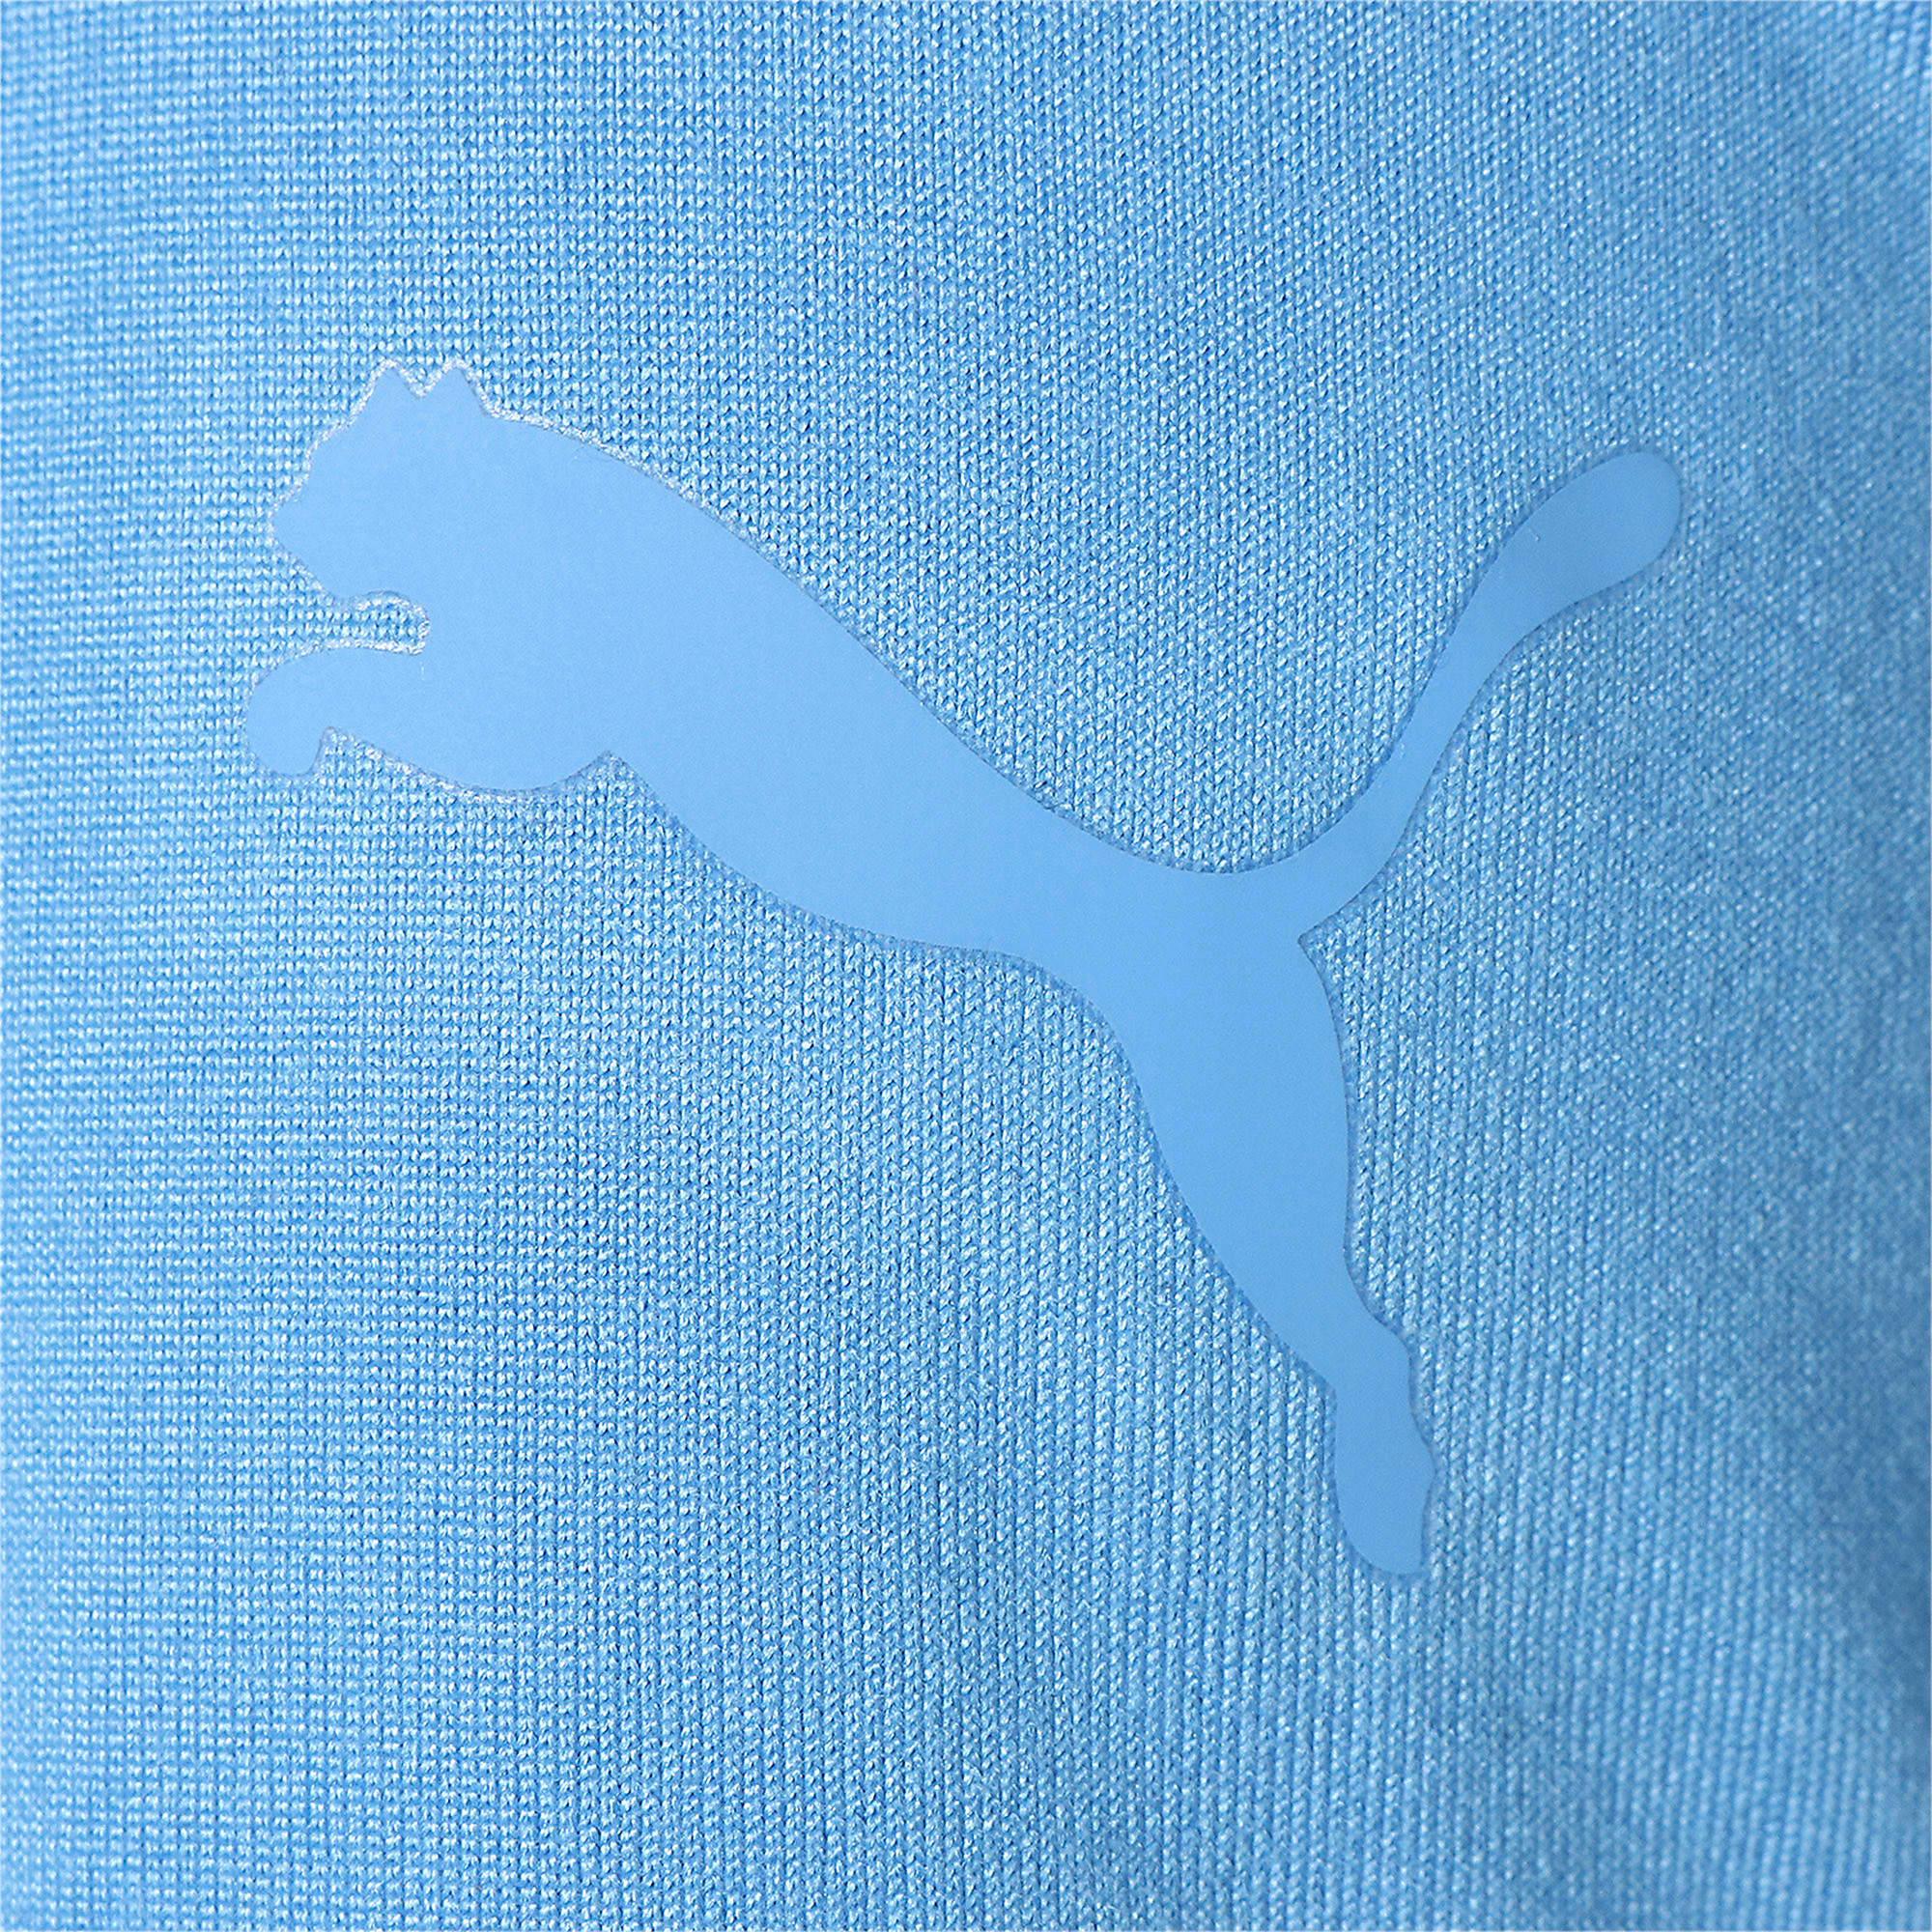 Thumbnail 4 of マンチェスター・シティ MCFC 125th アニバーサリー オーセンティックシャツ ユニフォーム, Marina-Puma White, medium-JPN